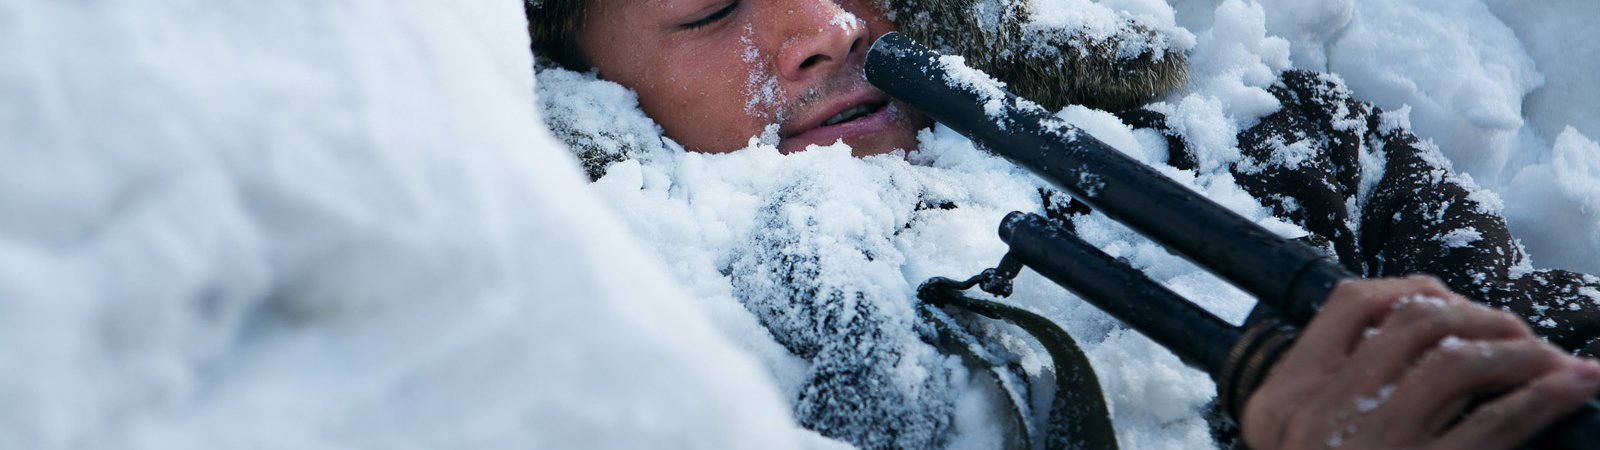 Photo dernier film Tony Leung Ka-Fai